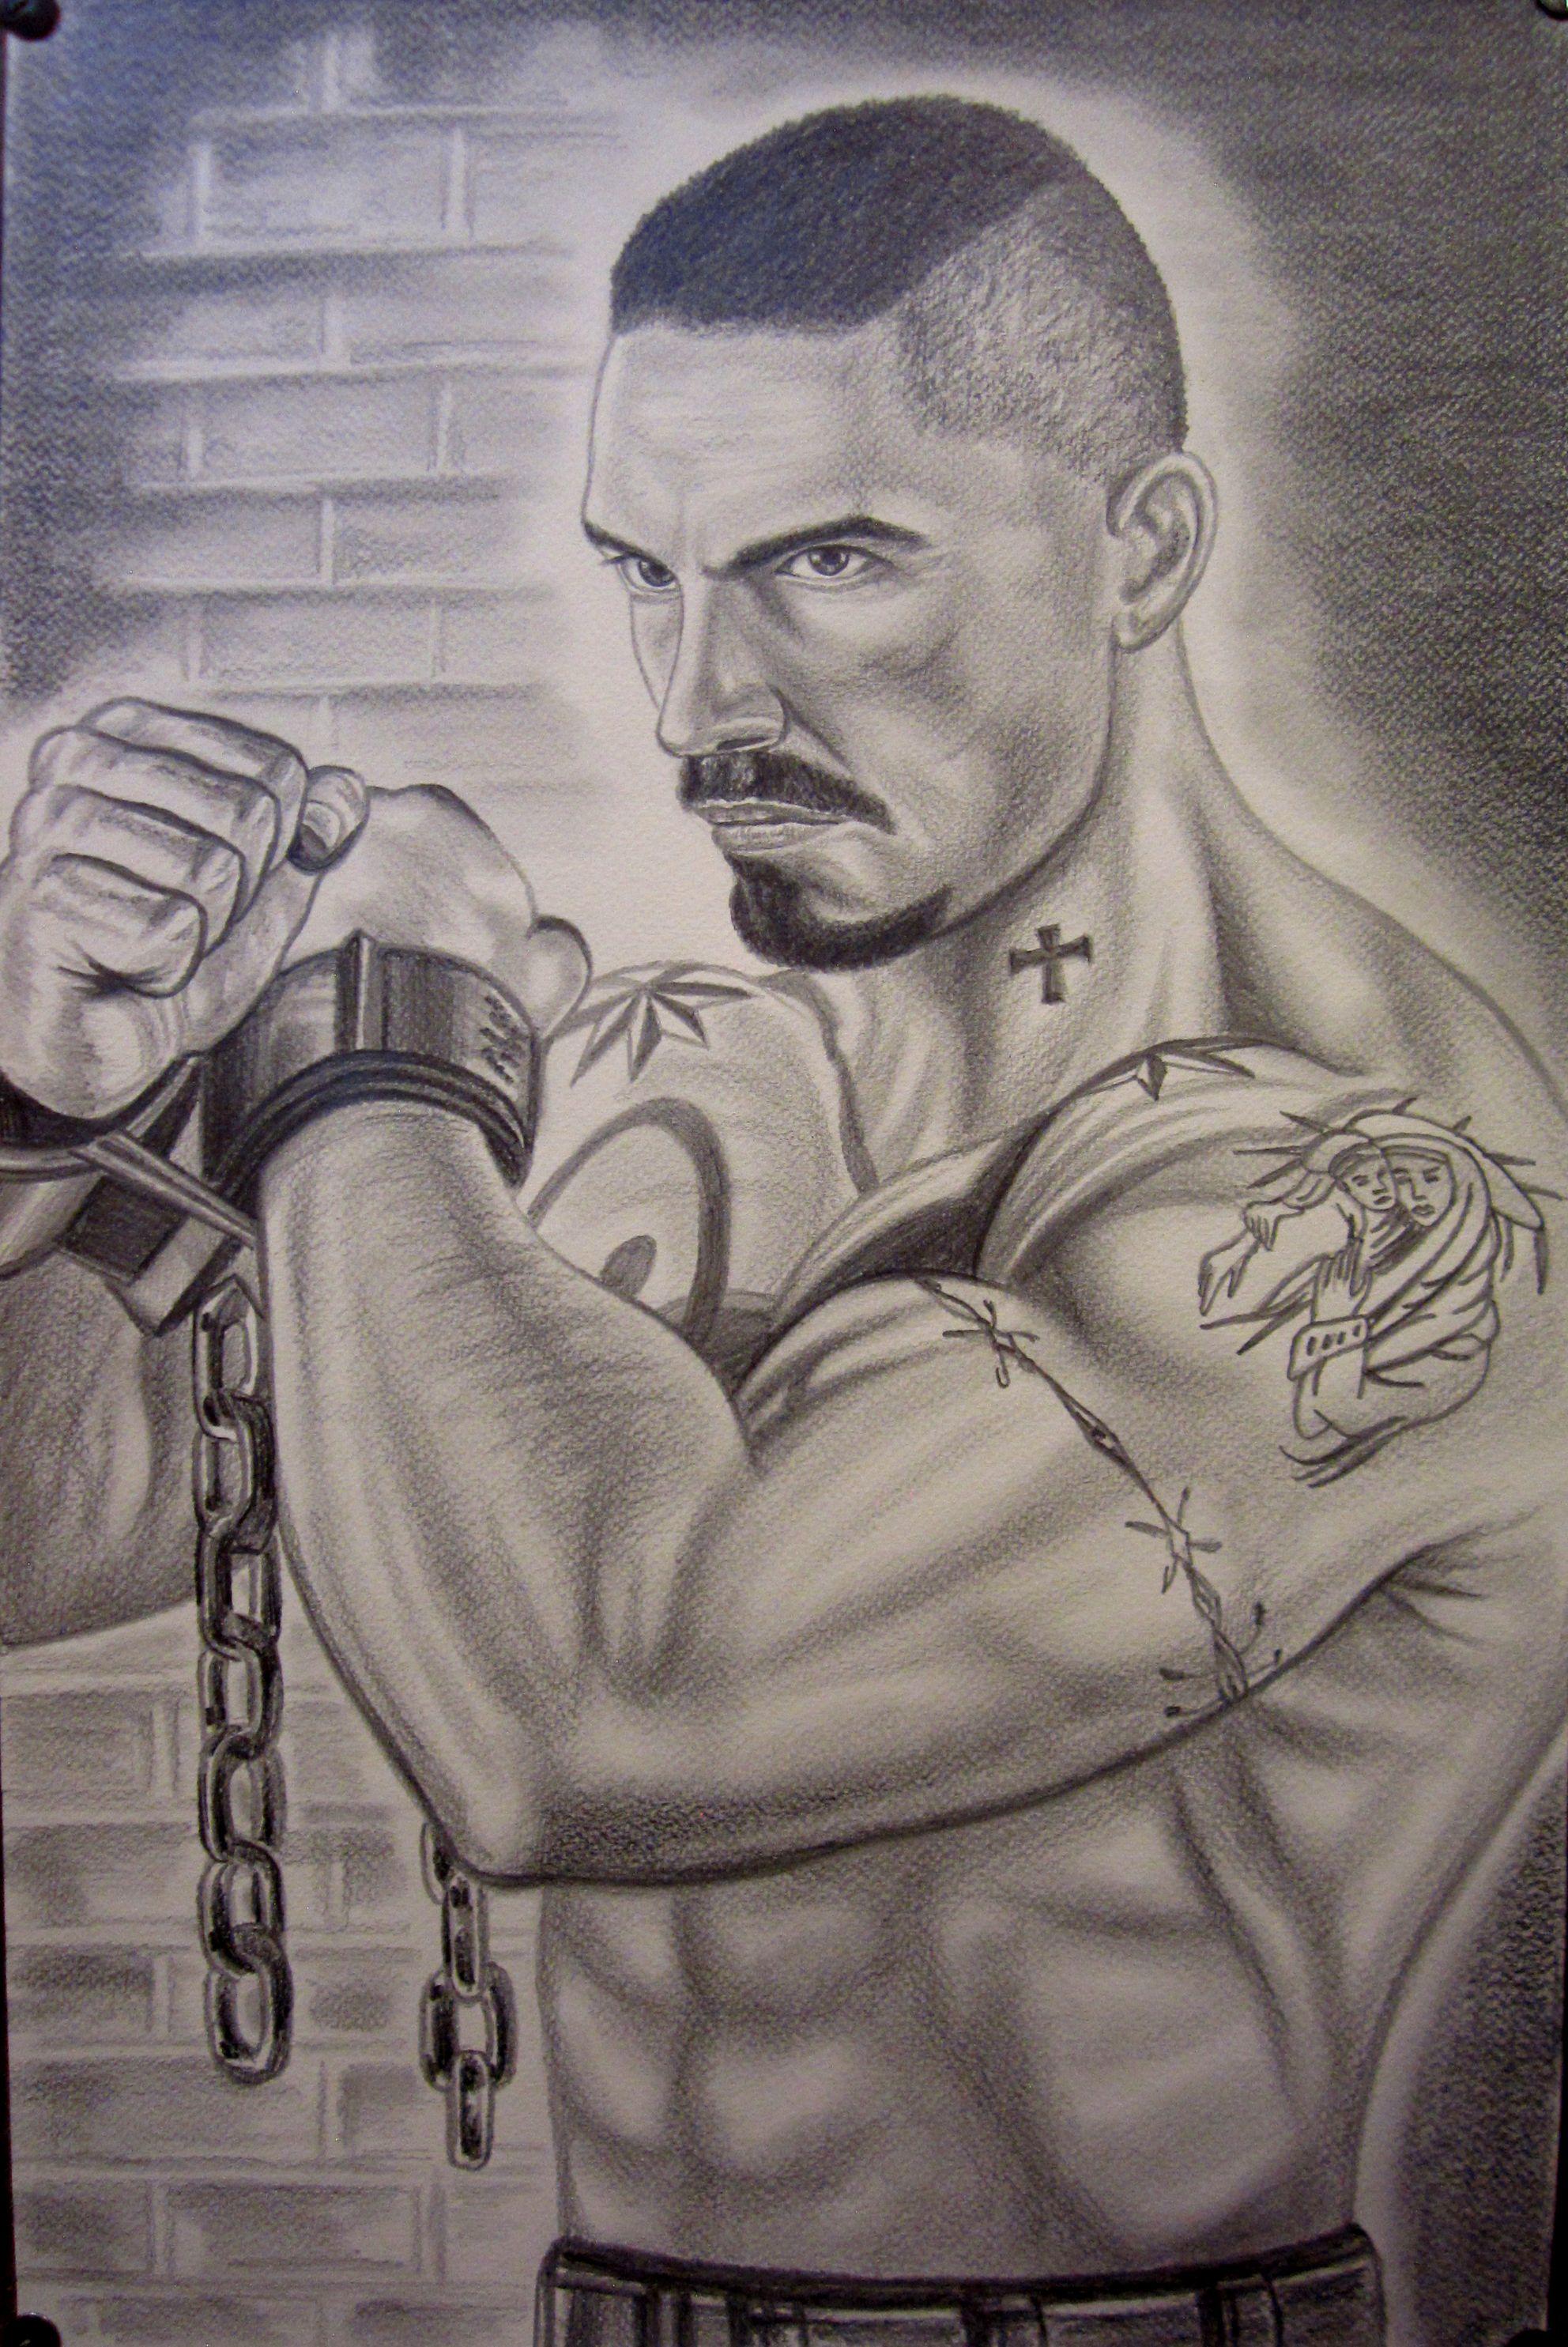 Undisputed 4 Yuri Boyka Scott Adkins Steemit Scott Adkins Muay Thai Martial Arts Martial Arts